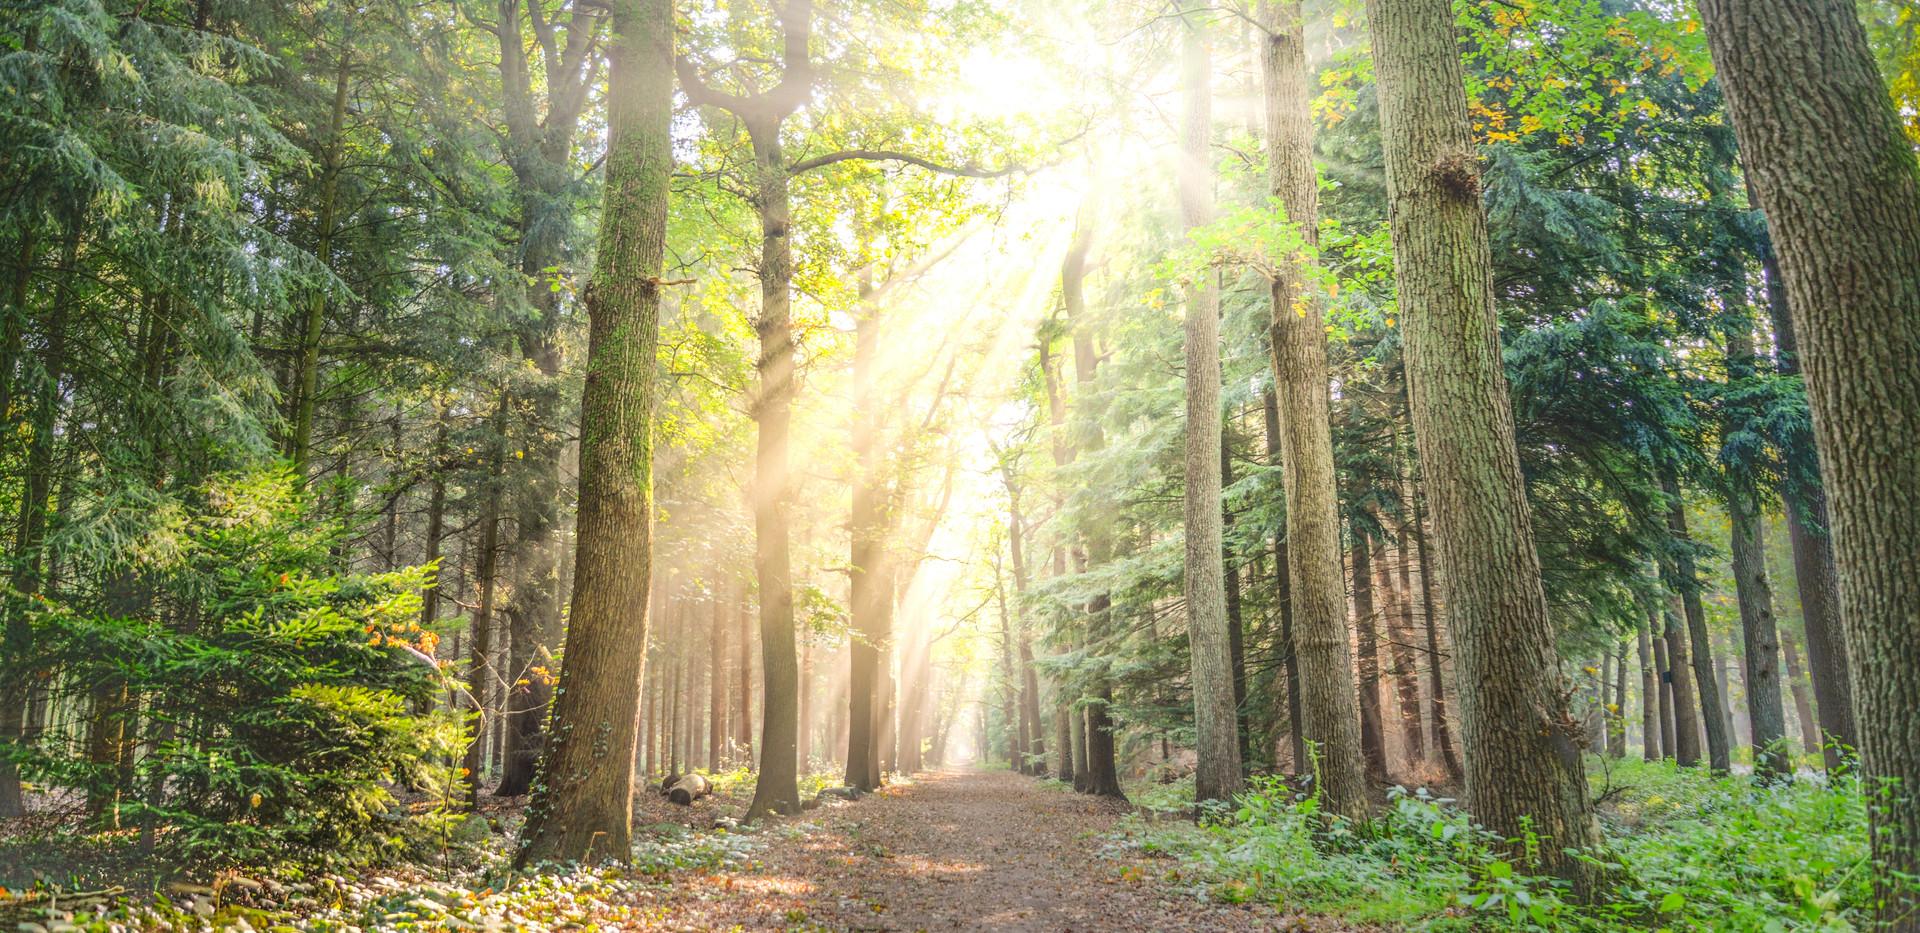 landscape-photo-of-pathway-between-green